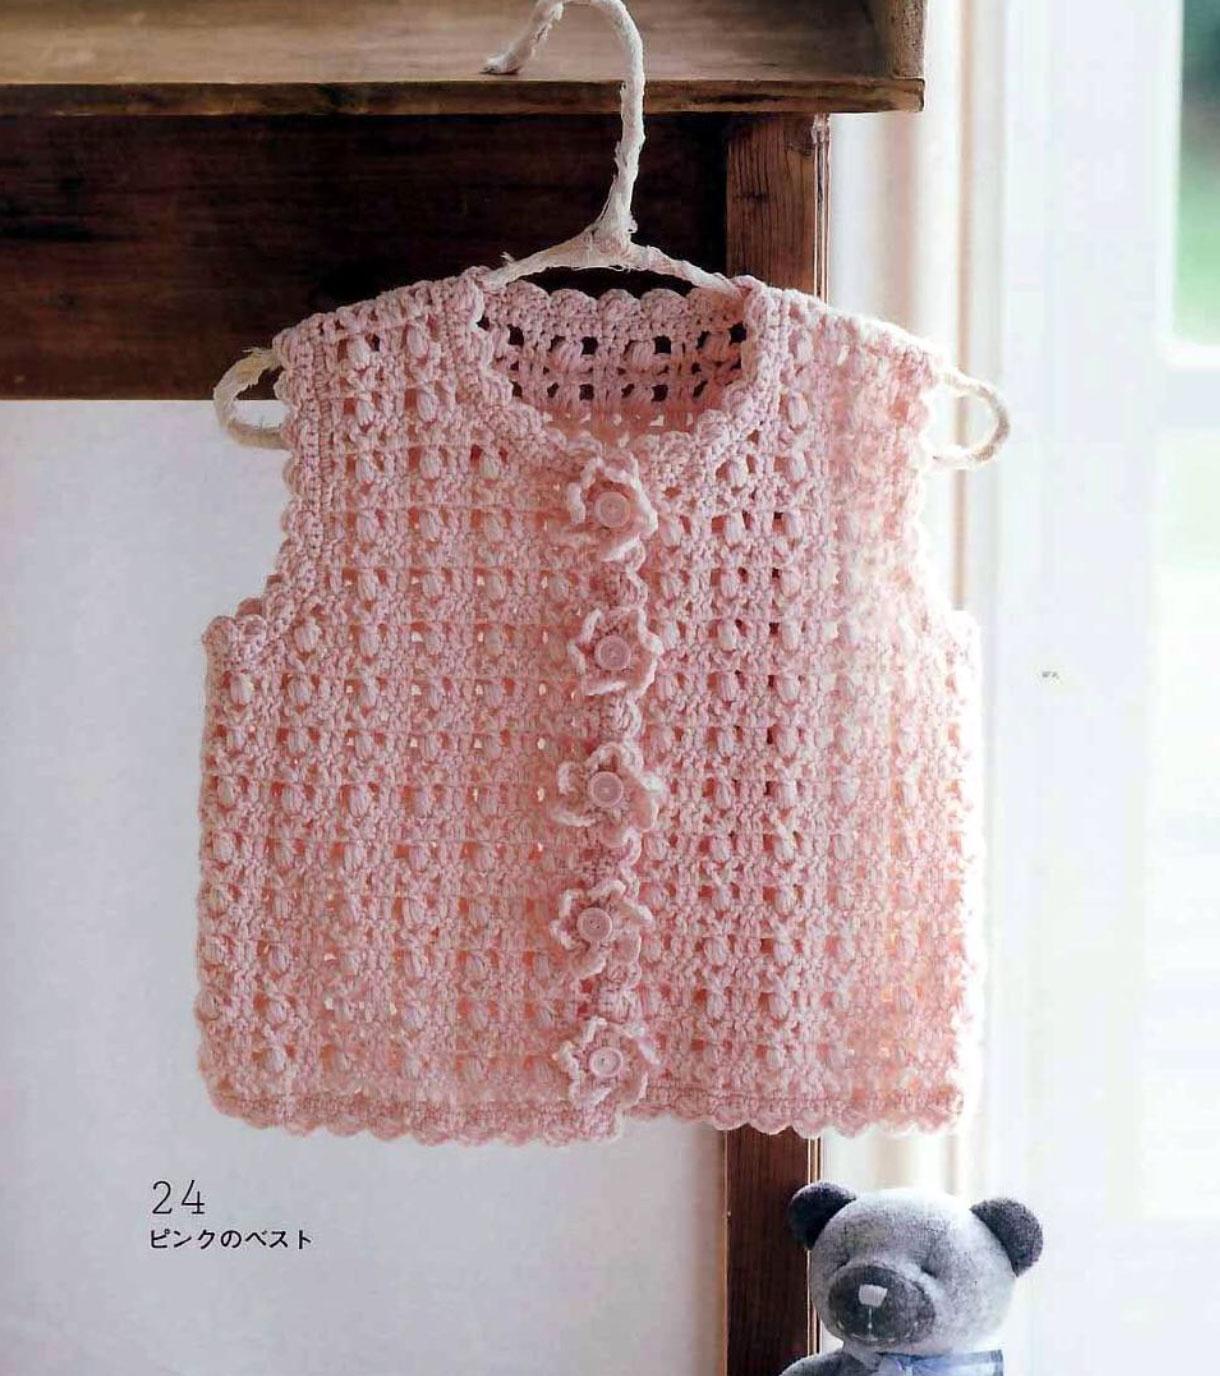 Crochet Vest 12 24 Months ⋆ Crochet Kingdom